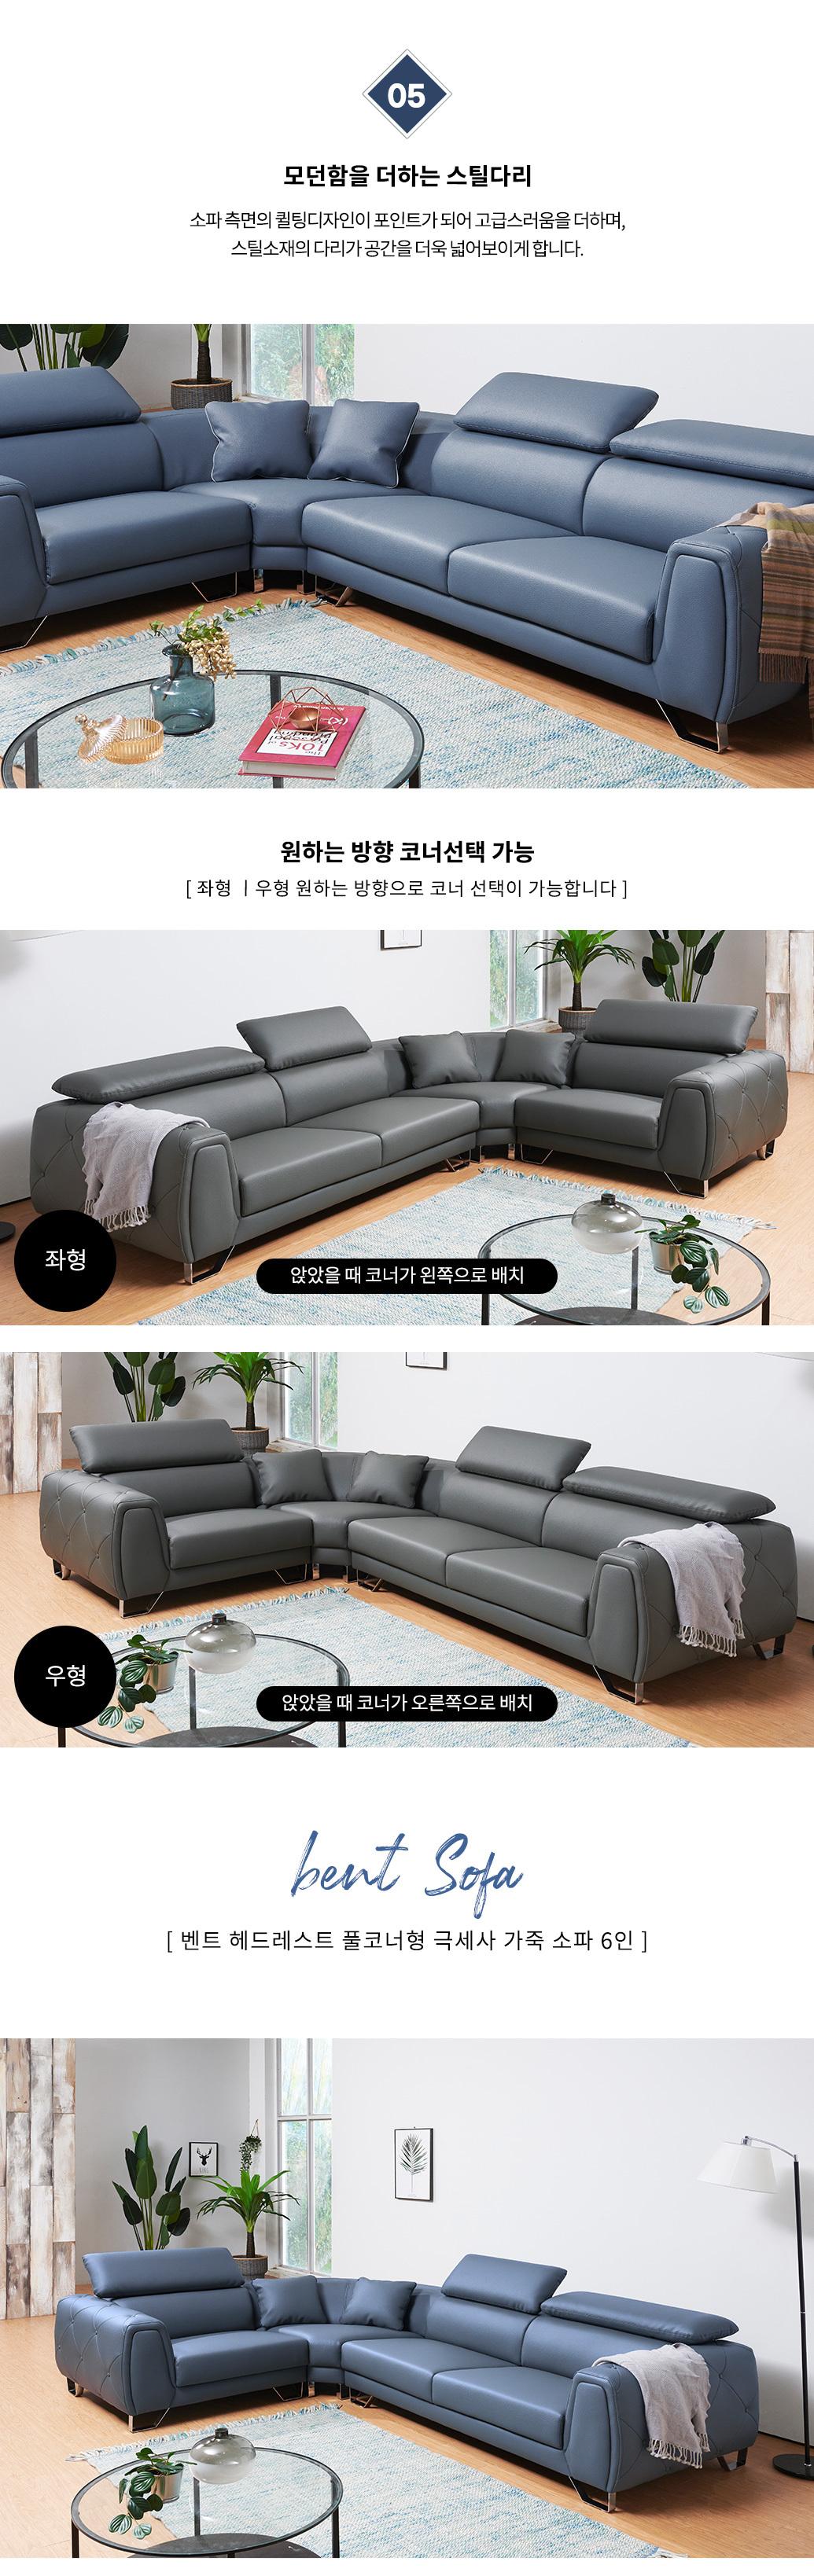 bent6_sofa_05.jpg